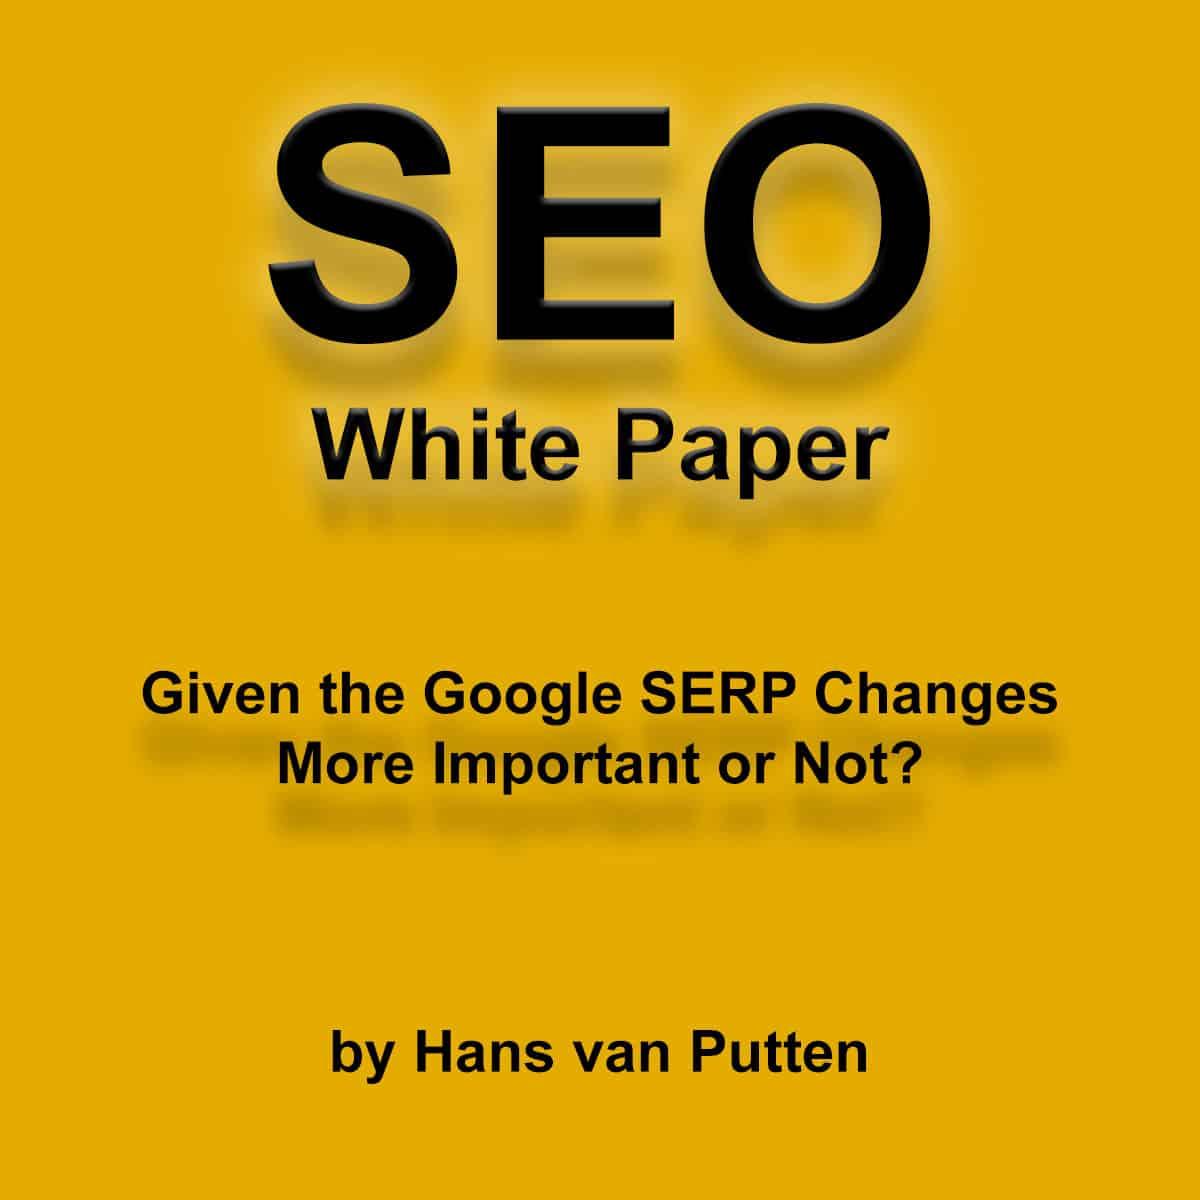 Hans van Putten - Portfolio - SEO White Paper